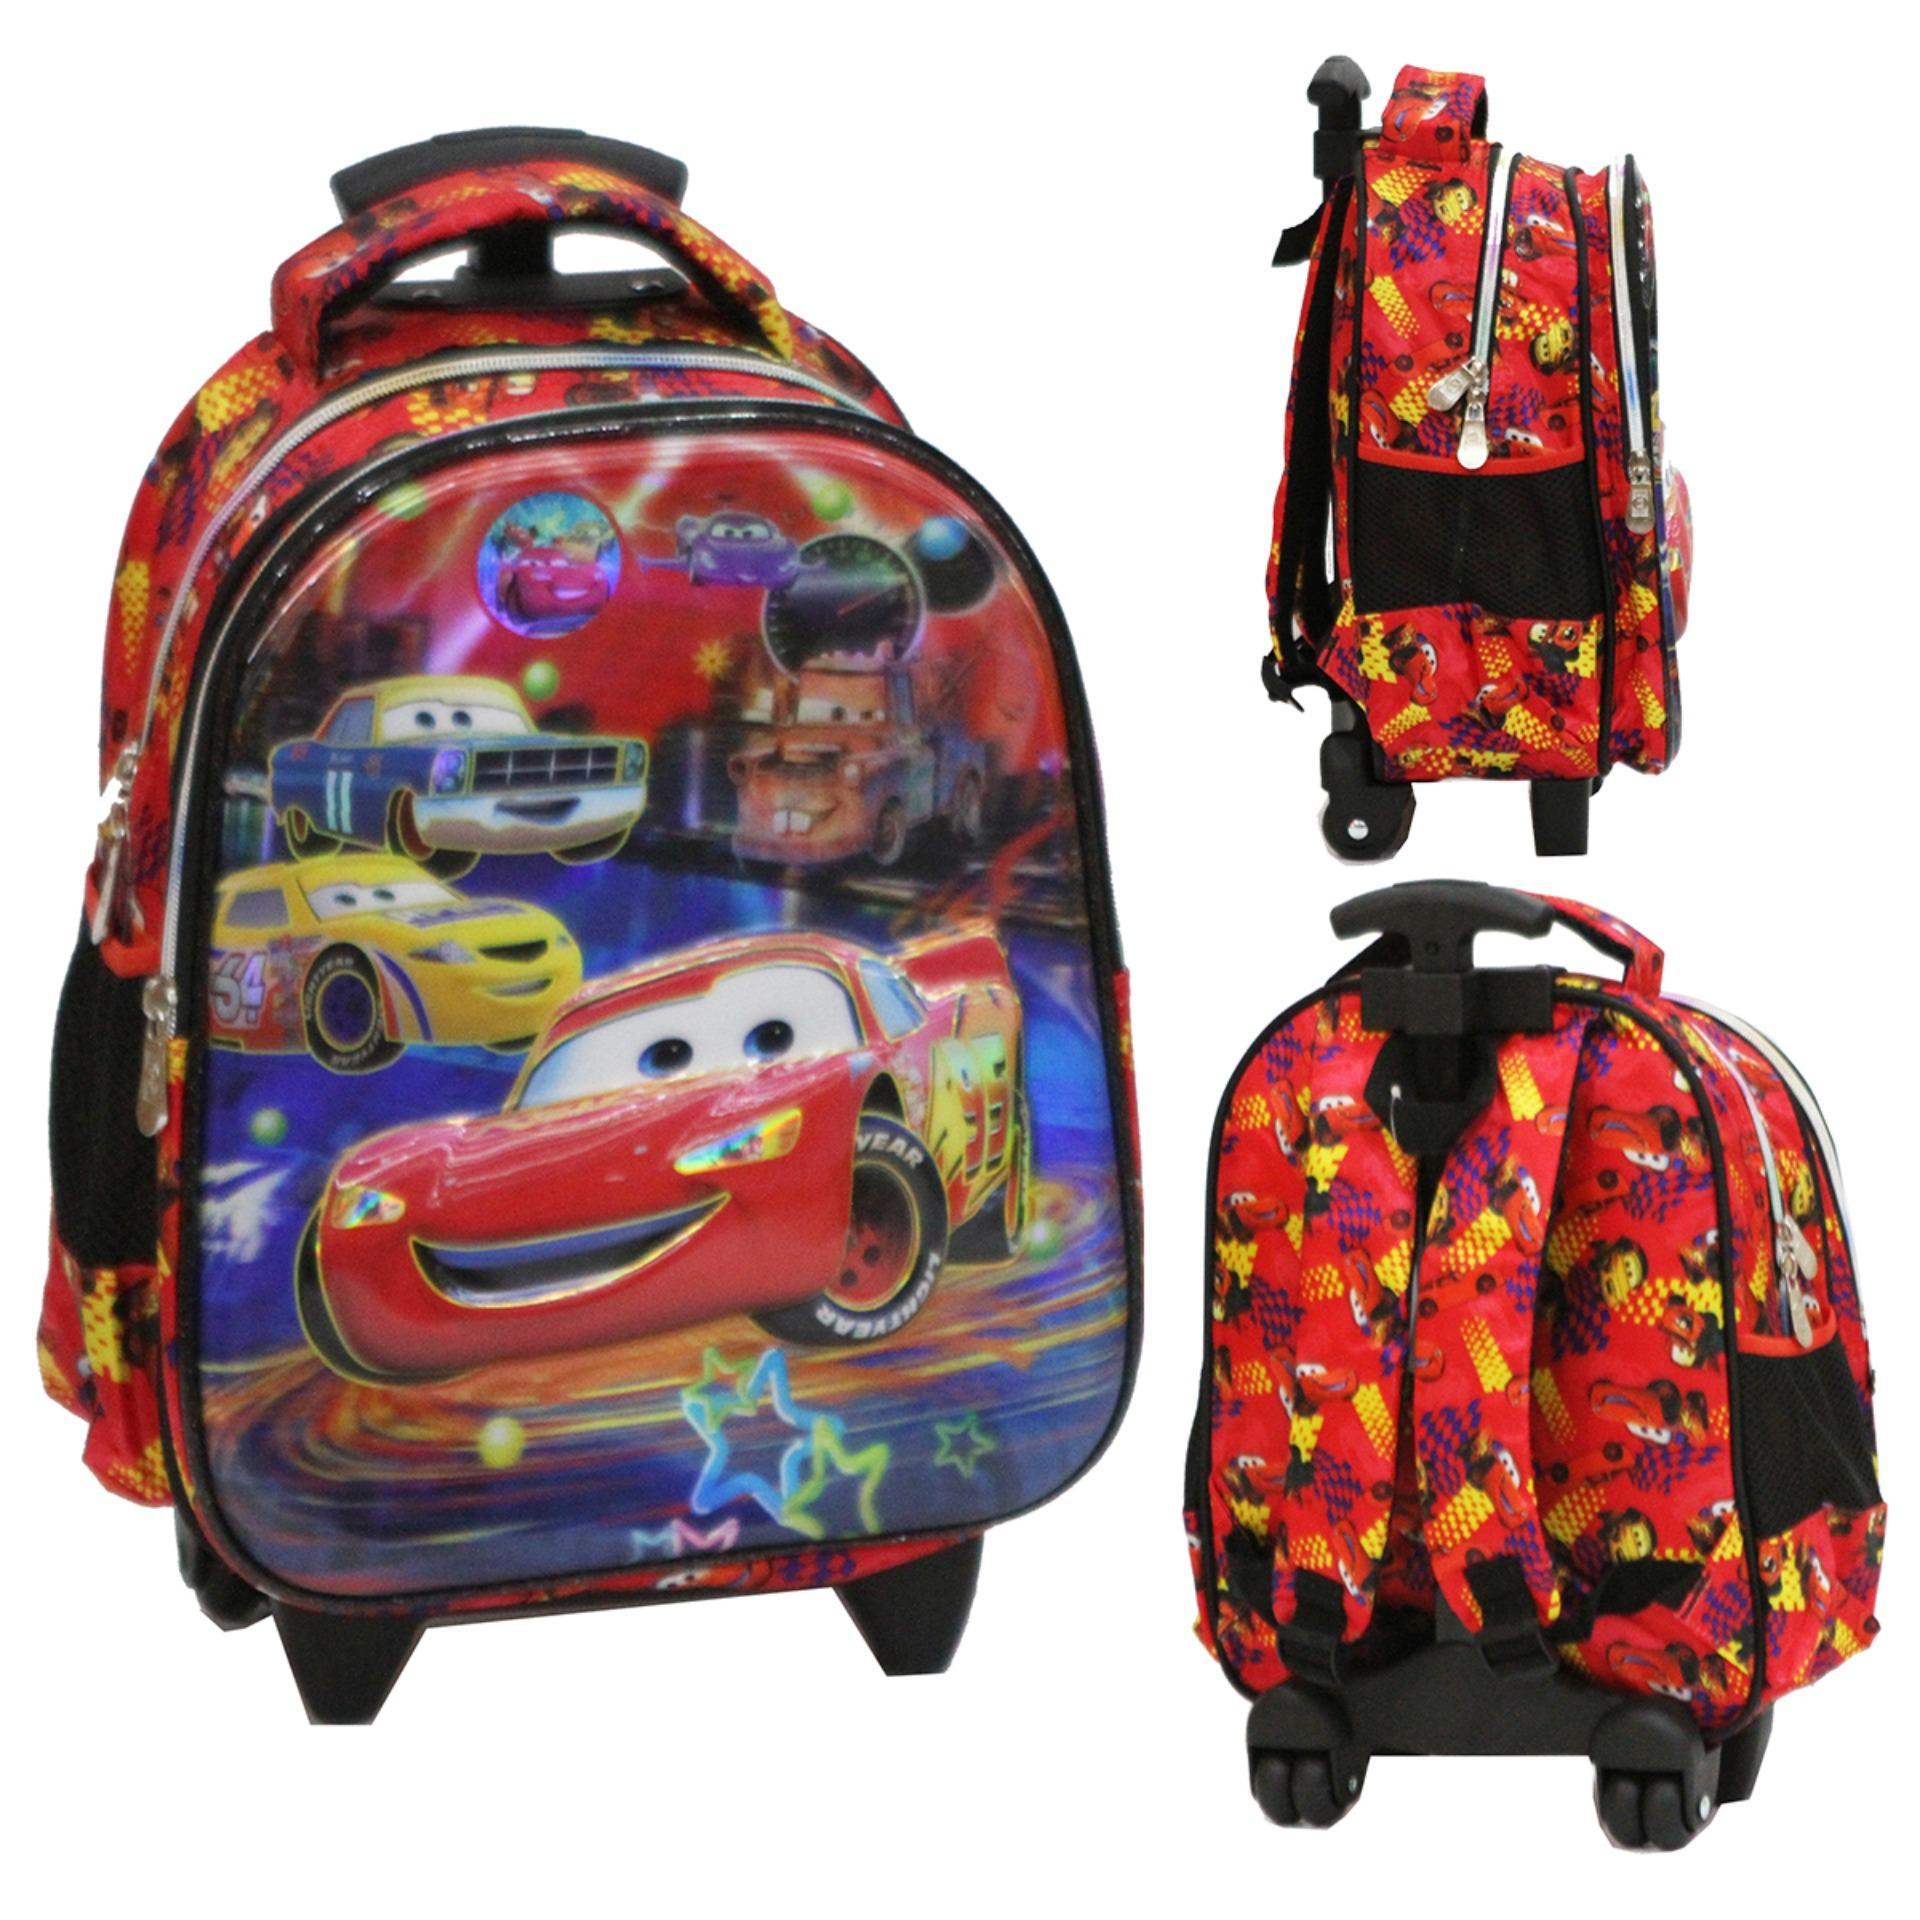 Diskon Onlan Tas Trolley Anak Sekolah Tk Pg Import Karakter Anak Laki Laki Akhir Tahun